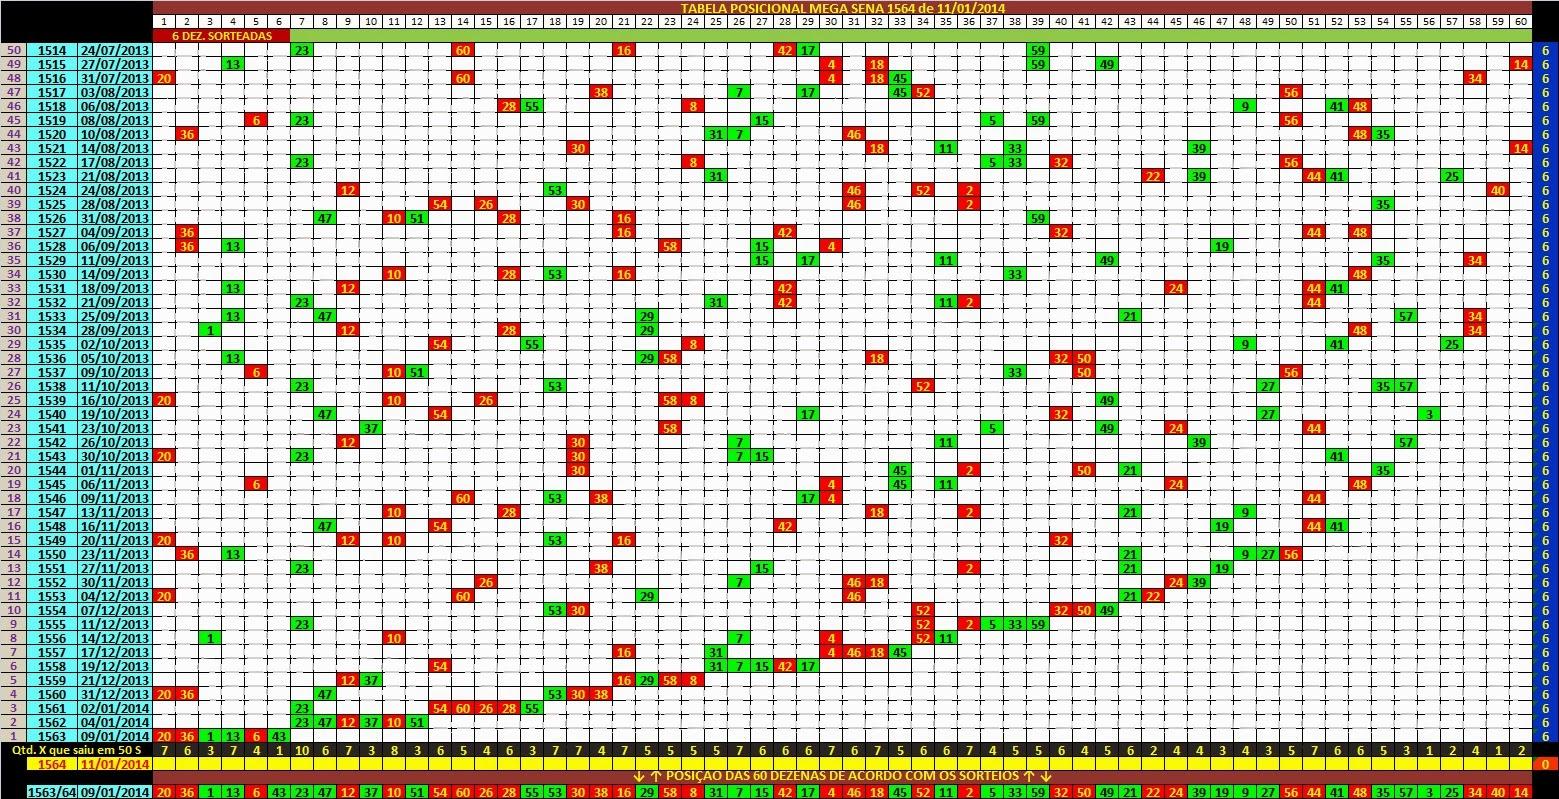 Clube das Loterias: TABELA POSICIONAL (50 S) = <b>MEGA SENA 1564</b> de <b>...</b> 2014